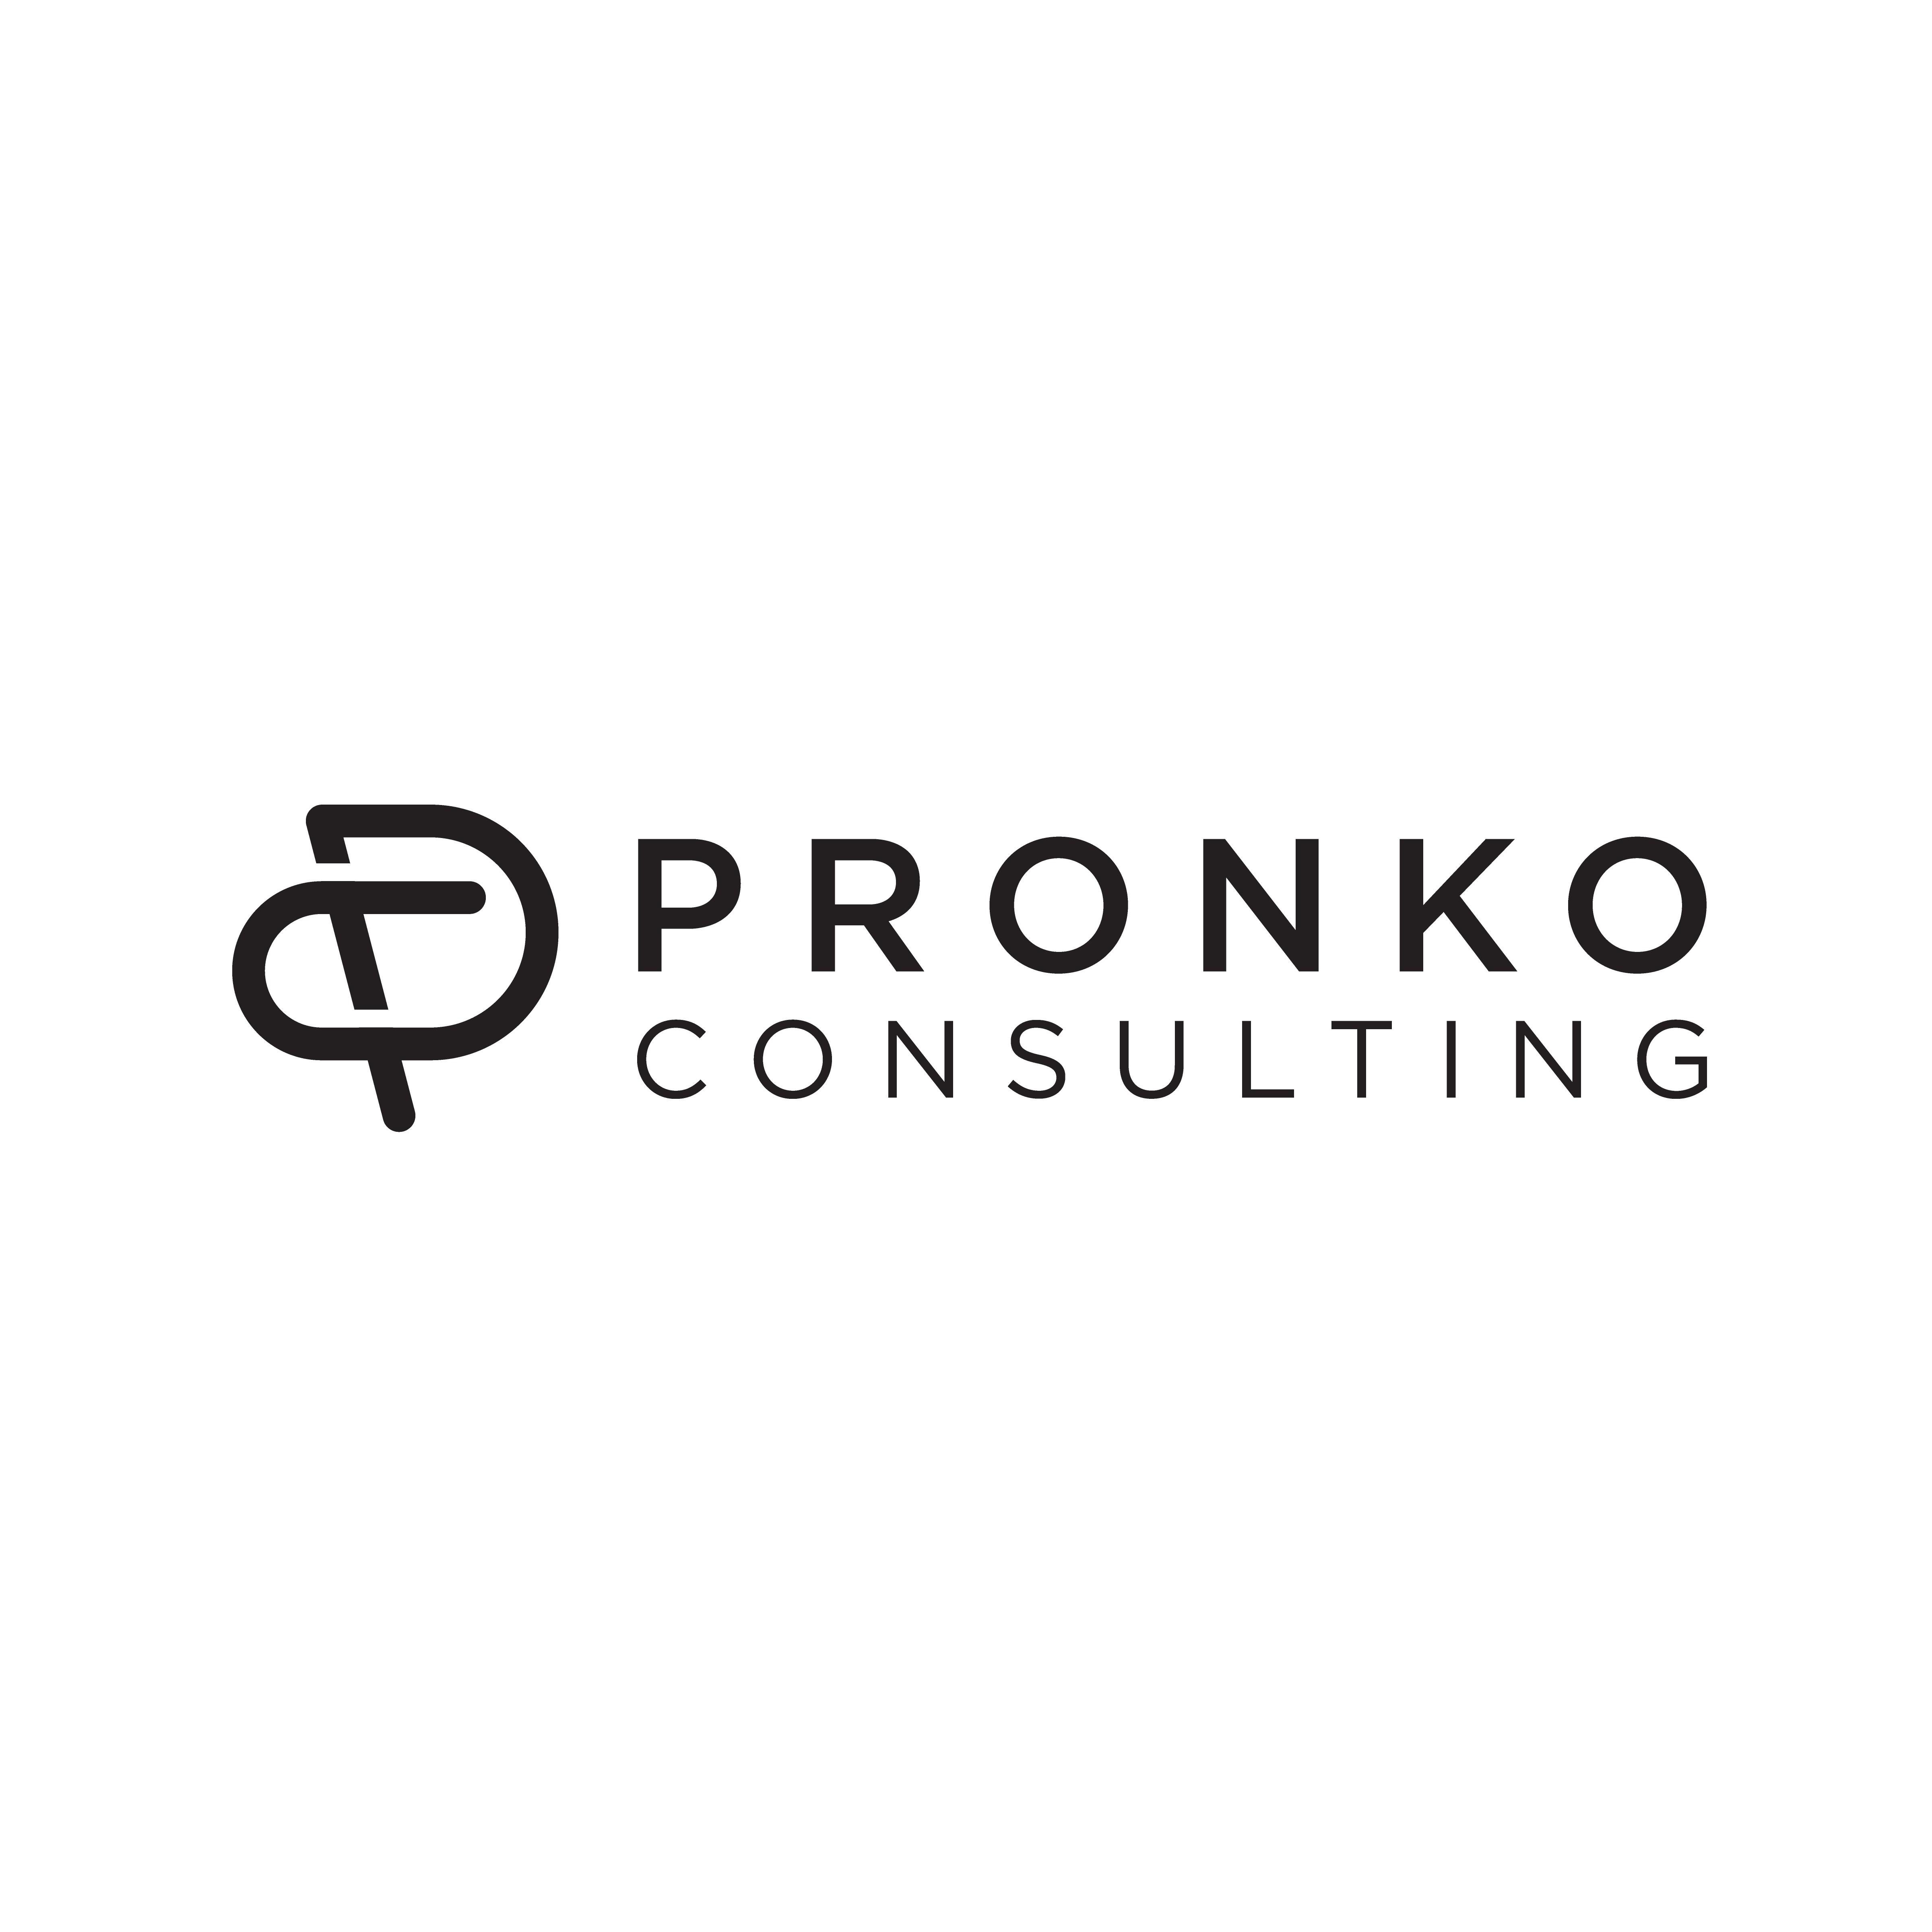 Design a company logo for Pronko Consulting